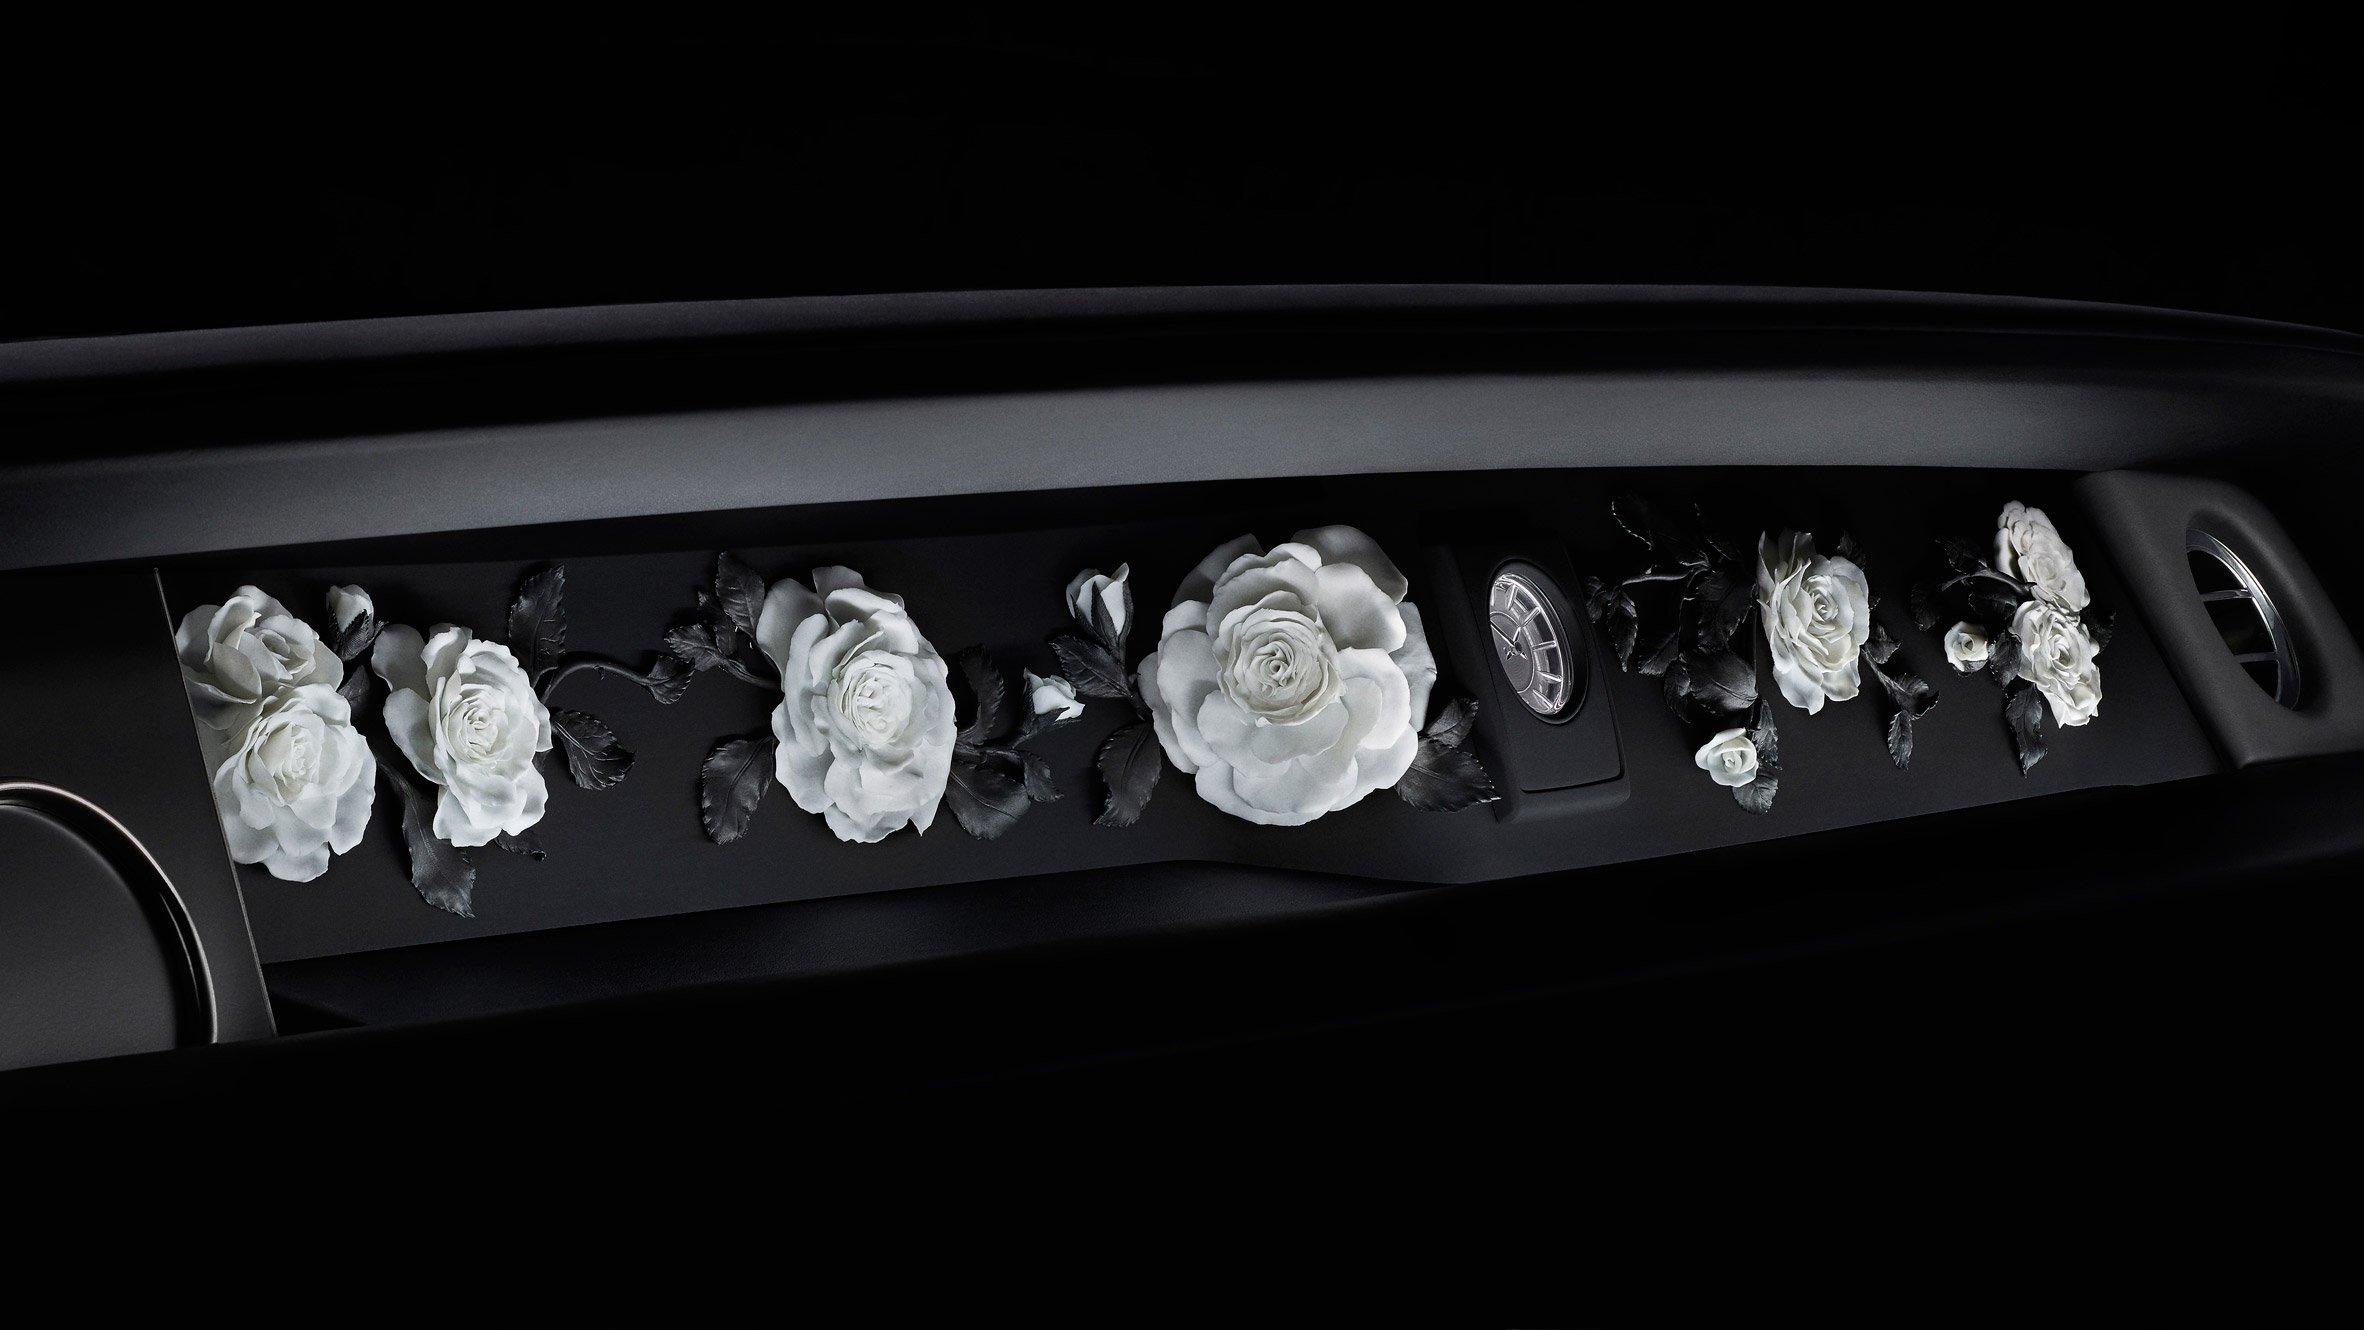 Rolls-Royce Phantom The Gallery - Flowers